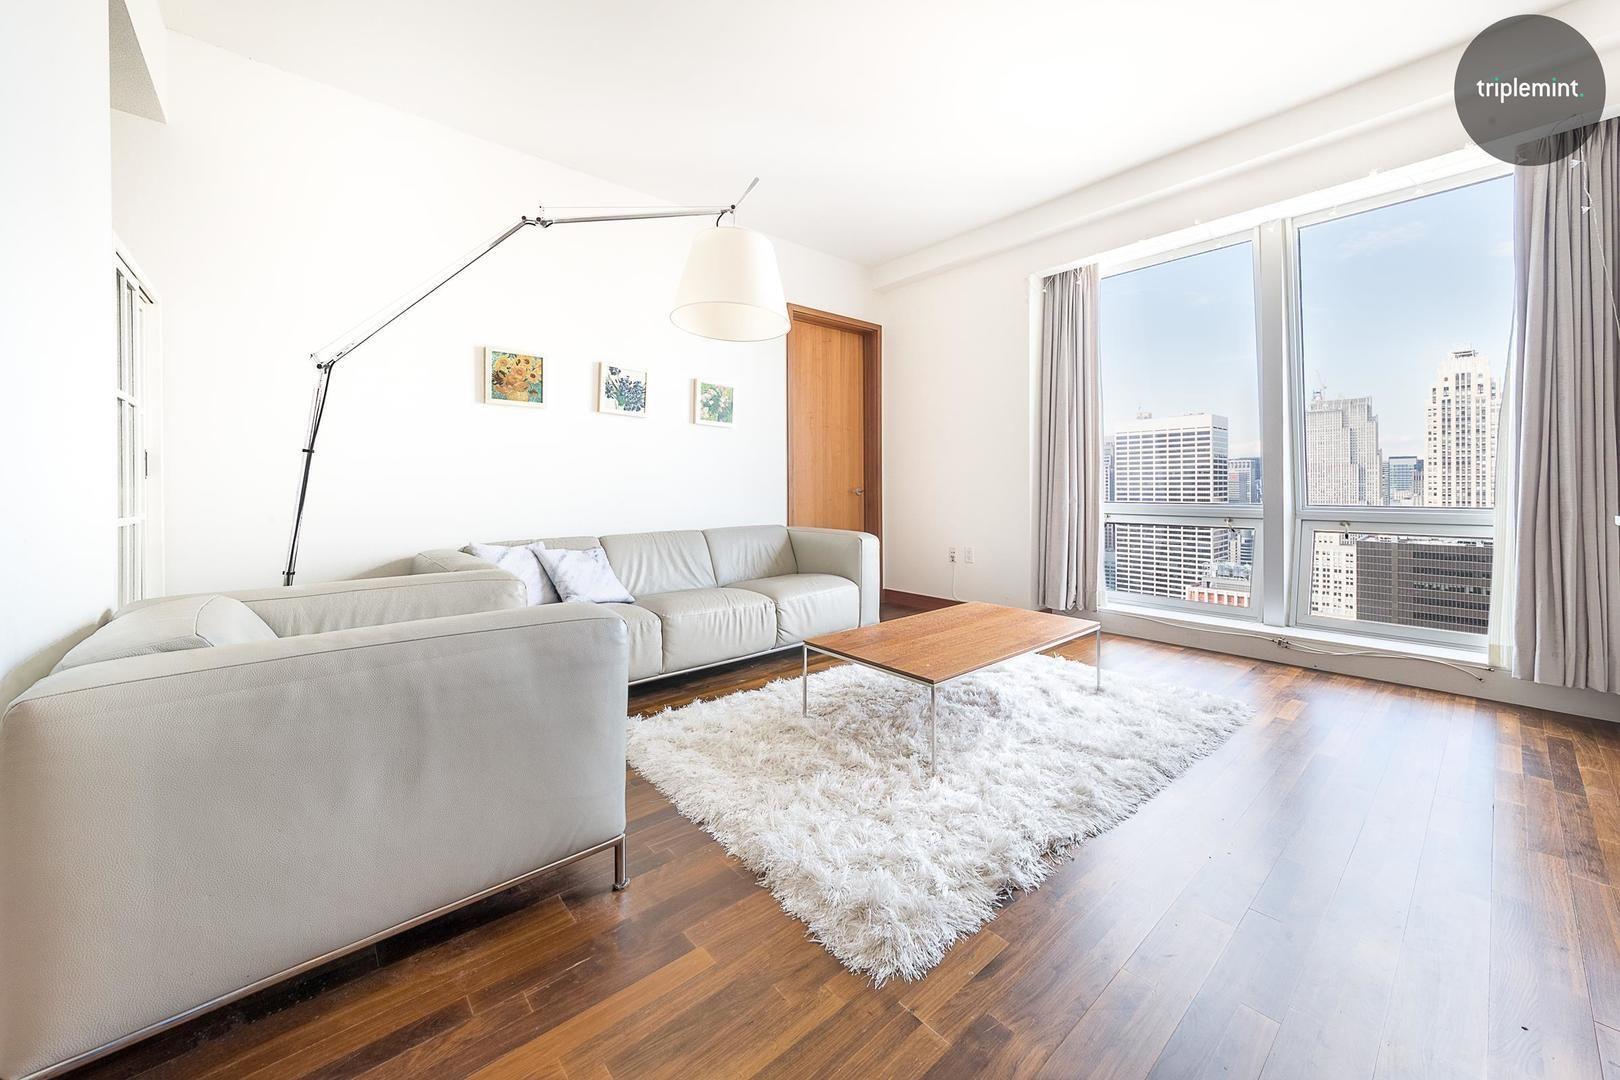 Apartment for sale at 400 Fifth Avenue, Apt 49-E